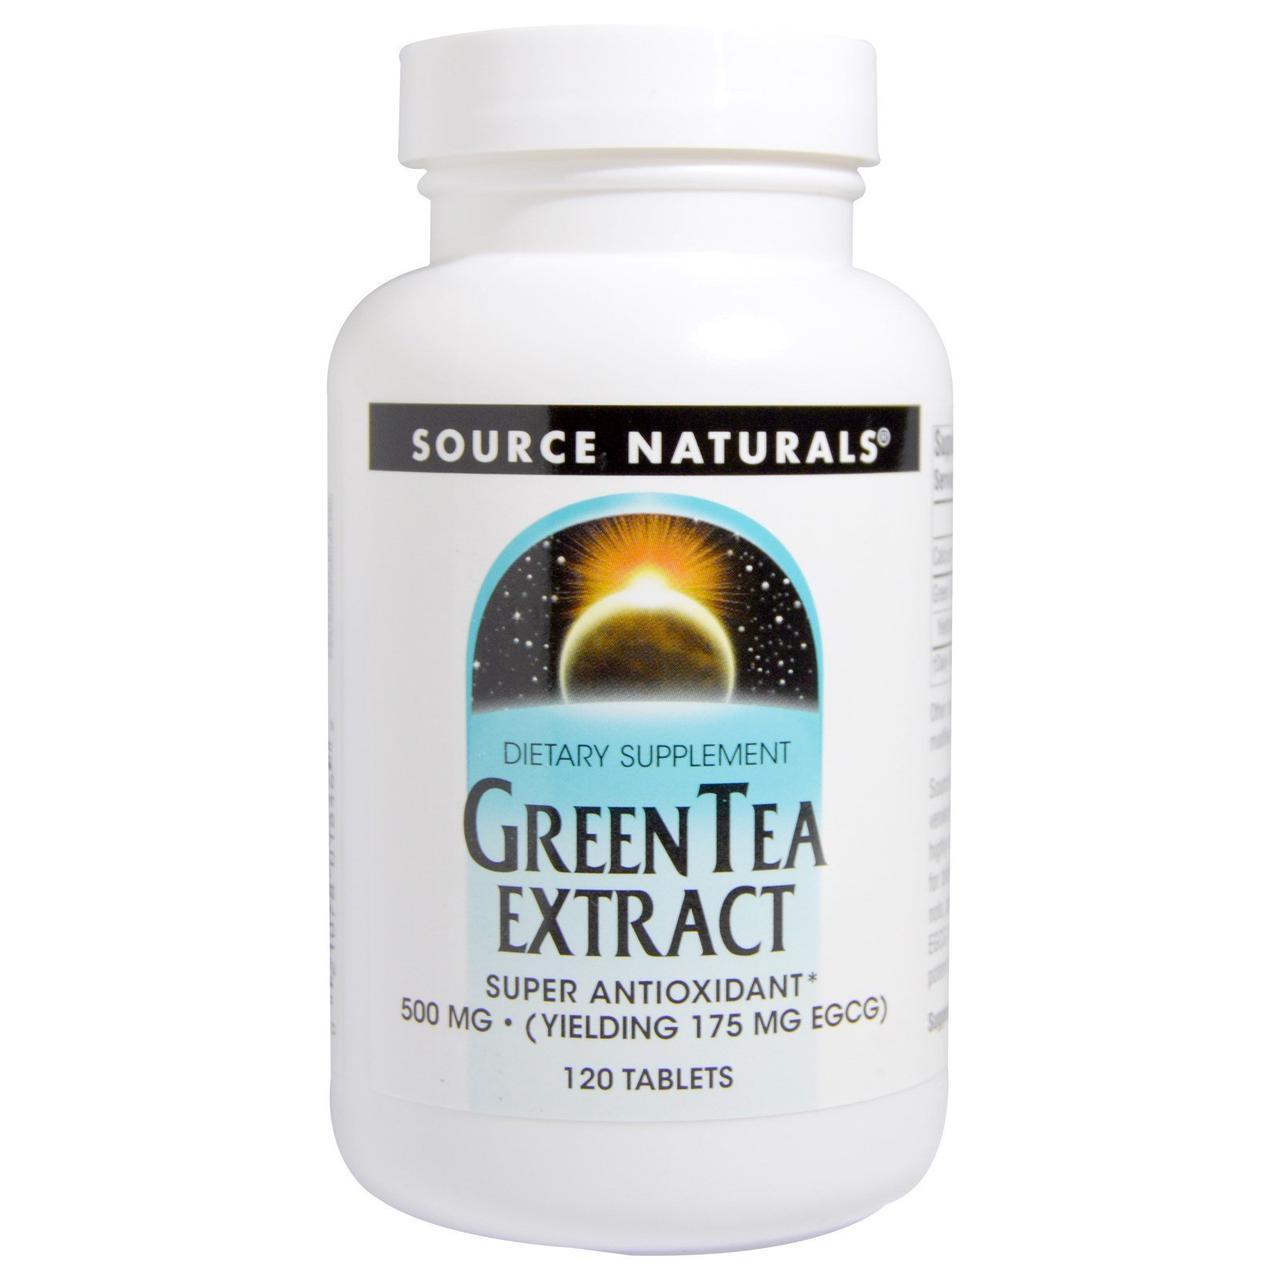 Зеленый чай экстракт (Green Tea Extract), Source Naturals, 500мг, 120 таб.